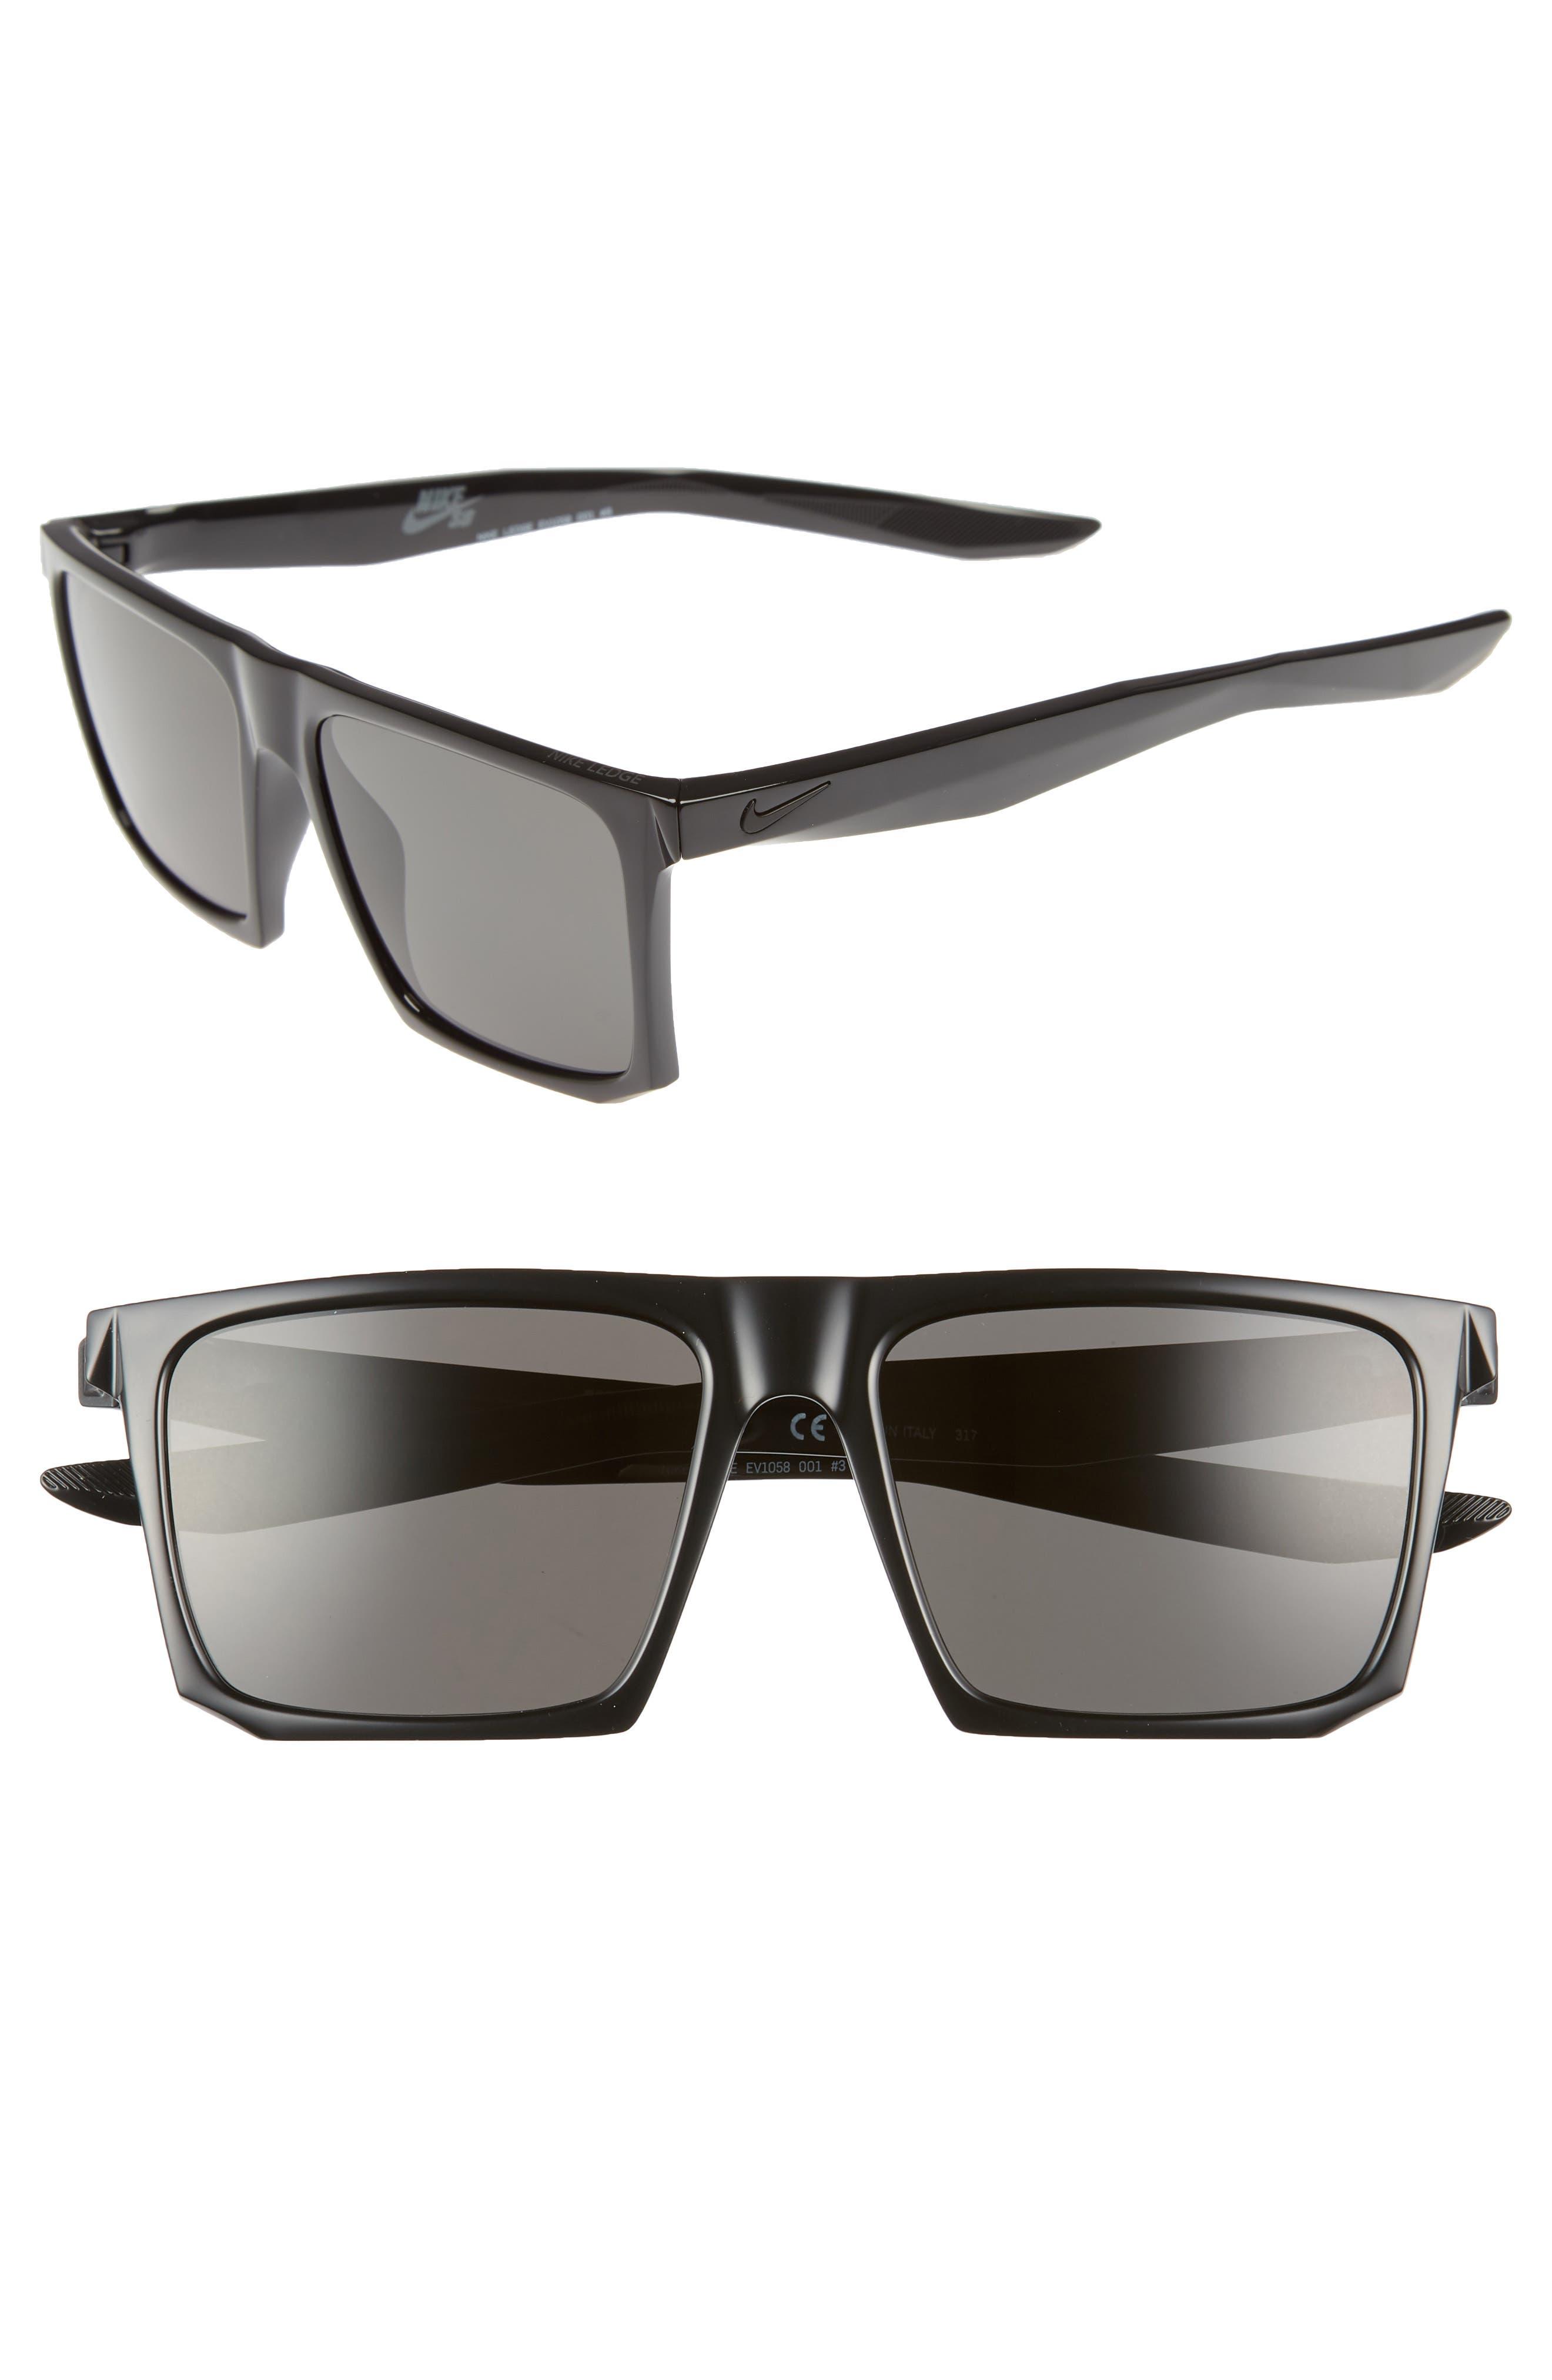 Nike Ledge 5m Sunglasses - Black/ Dark Grey